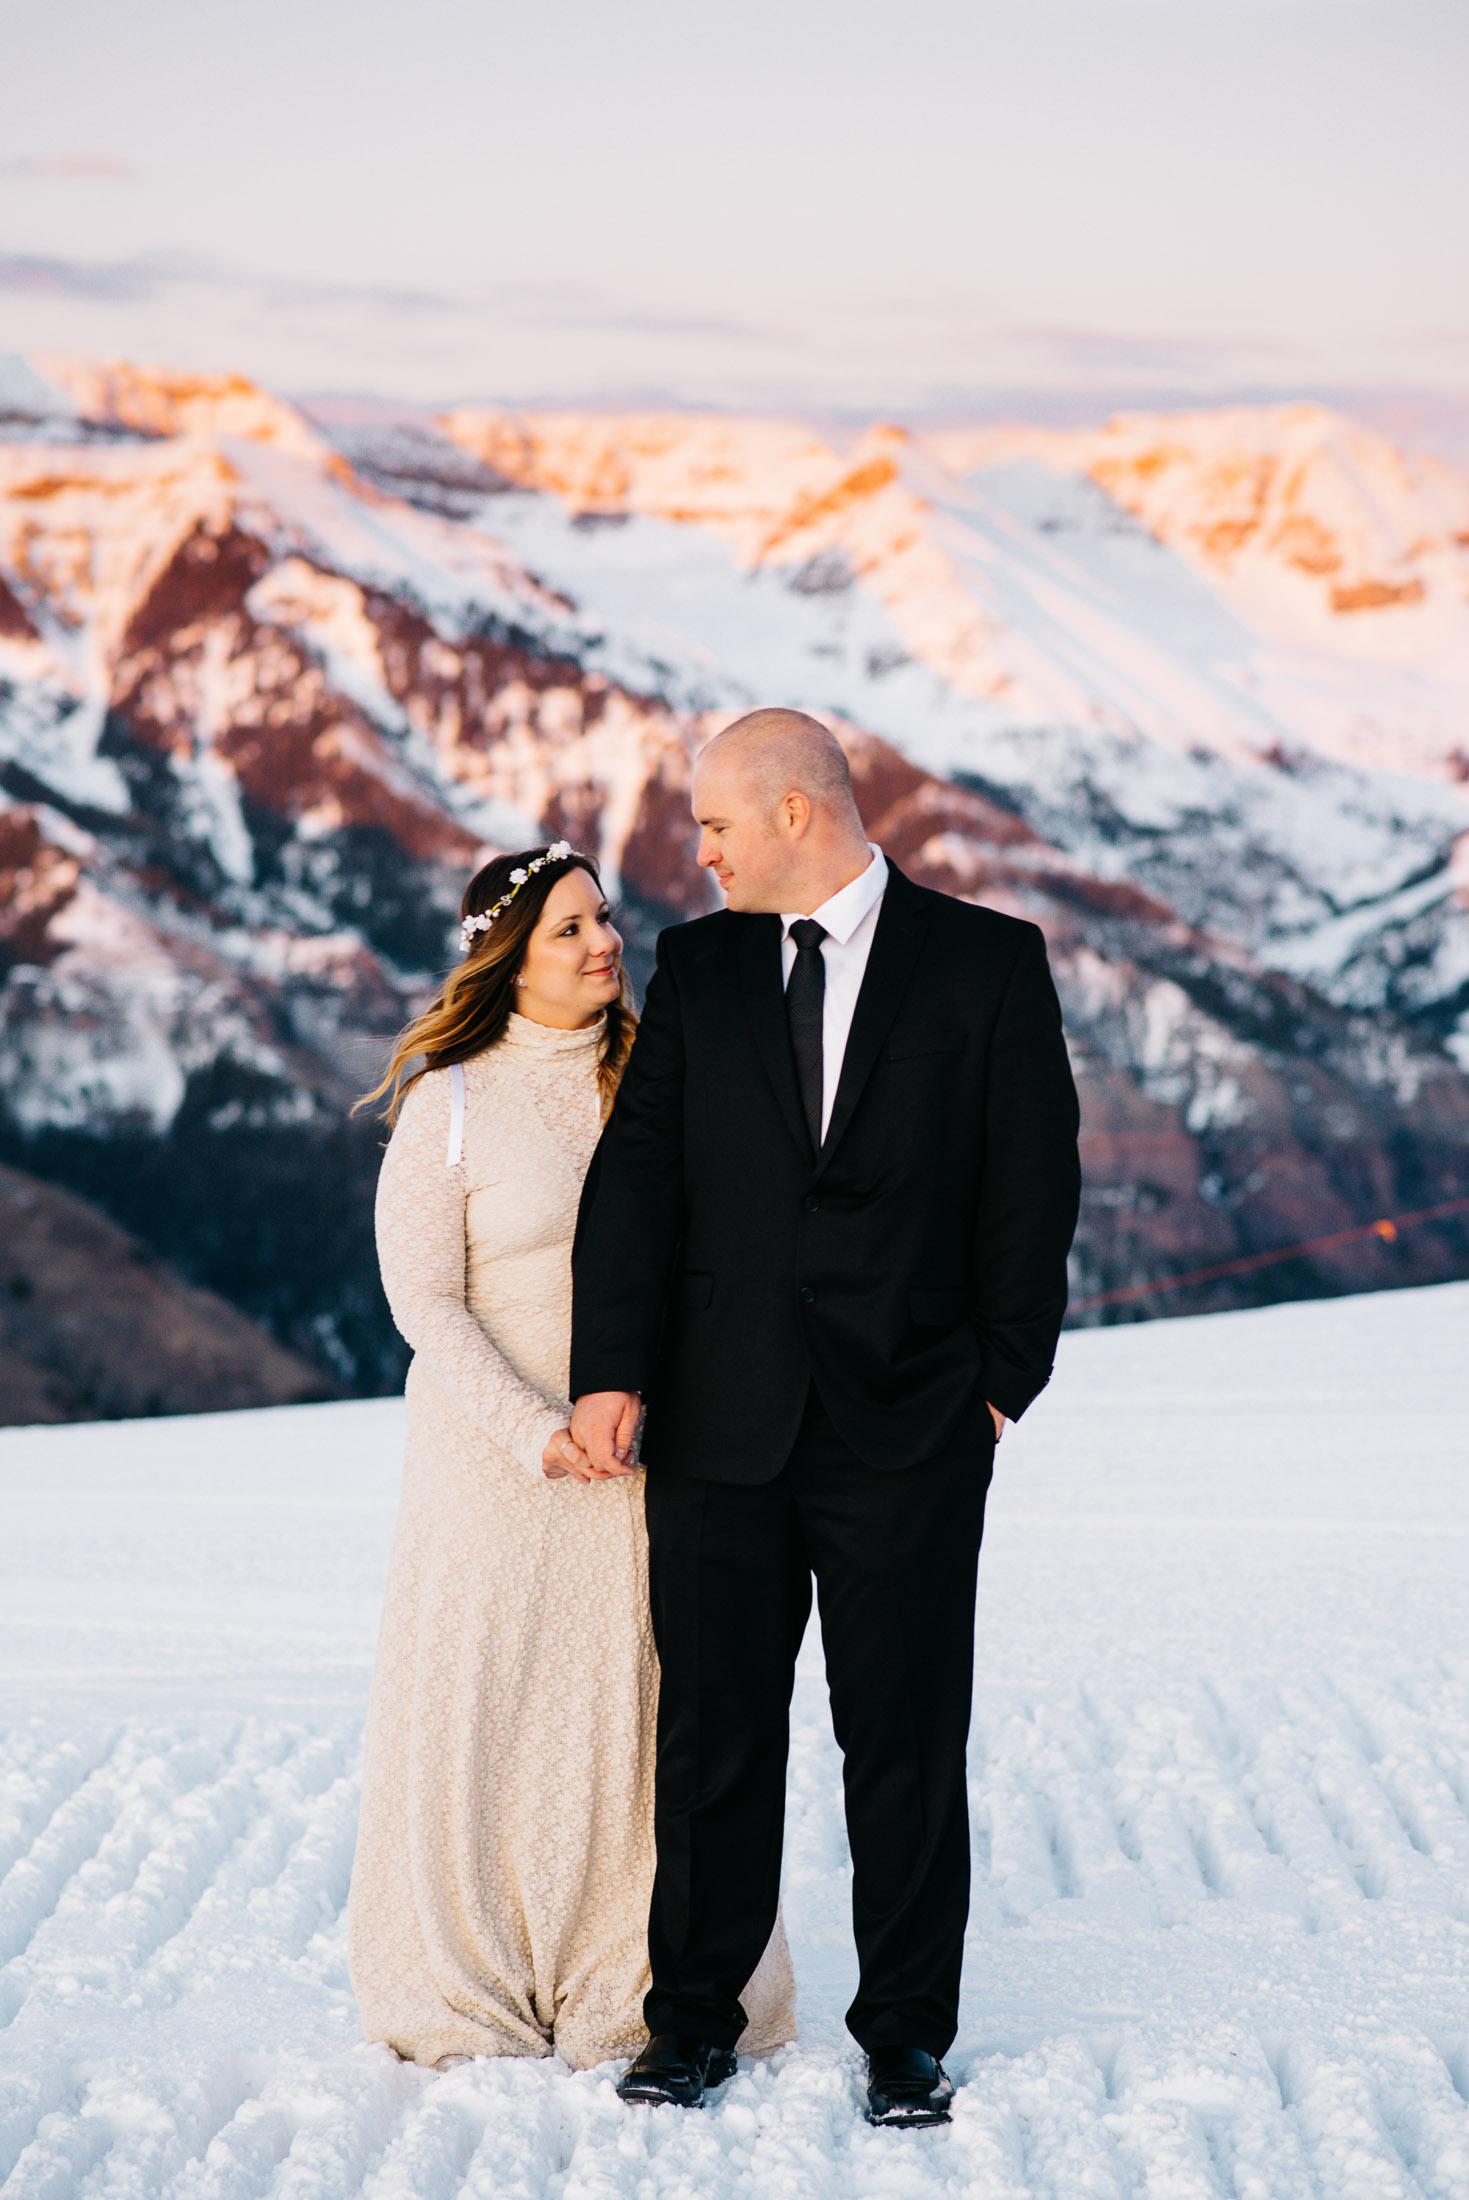 83elopement-photographer-colorado-telluride-winter-wedding-mountain-wedding-photographer-paige&chad-1035-2.jpg